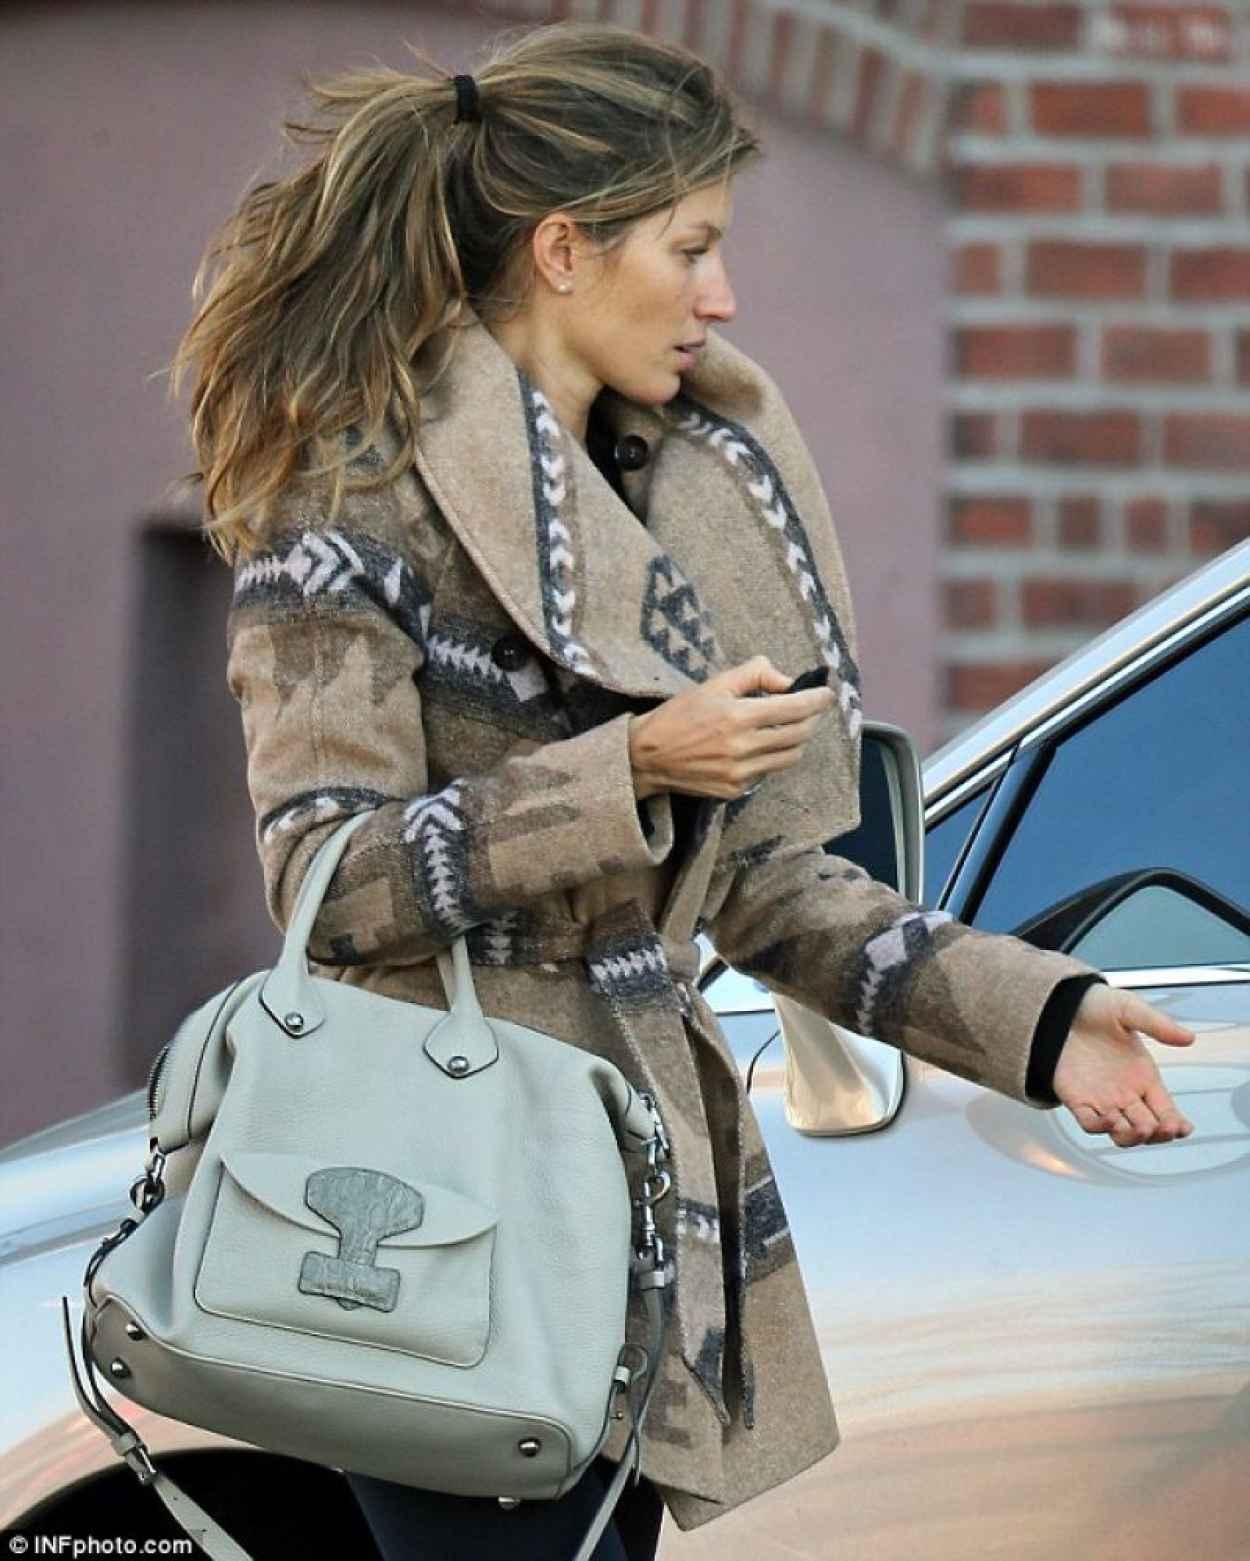 Gisele Bundchen Street Style - Out in Boston - November 2015-1